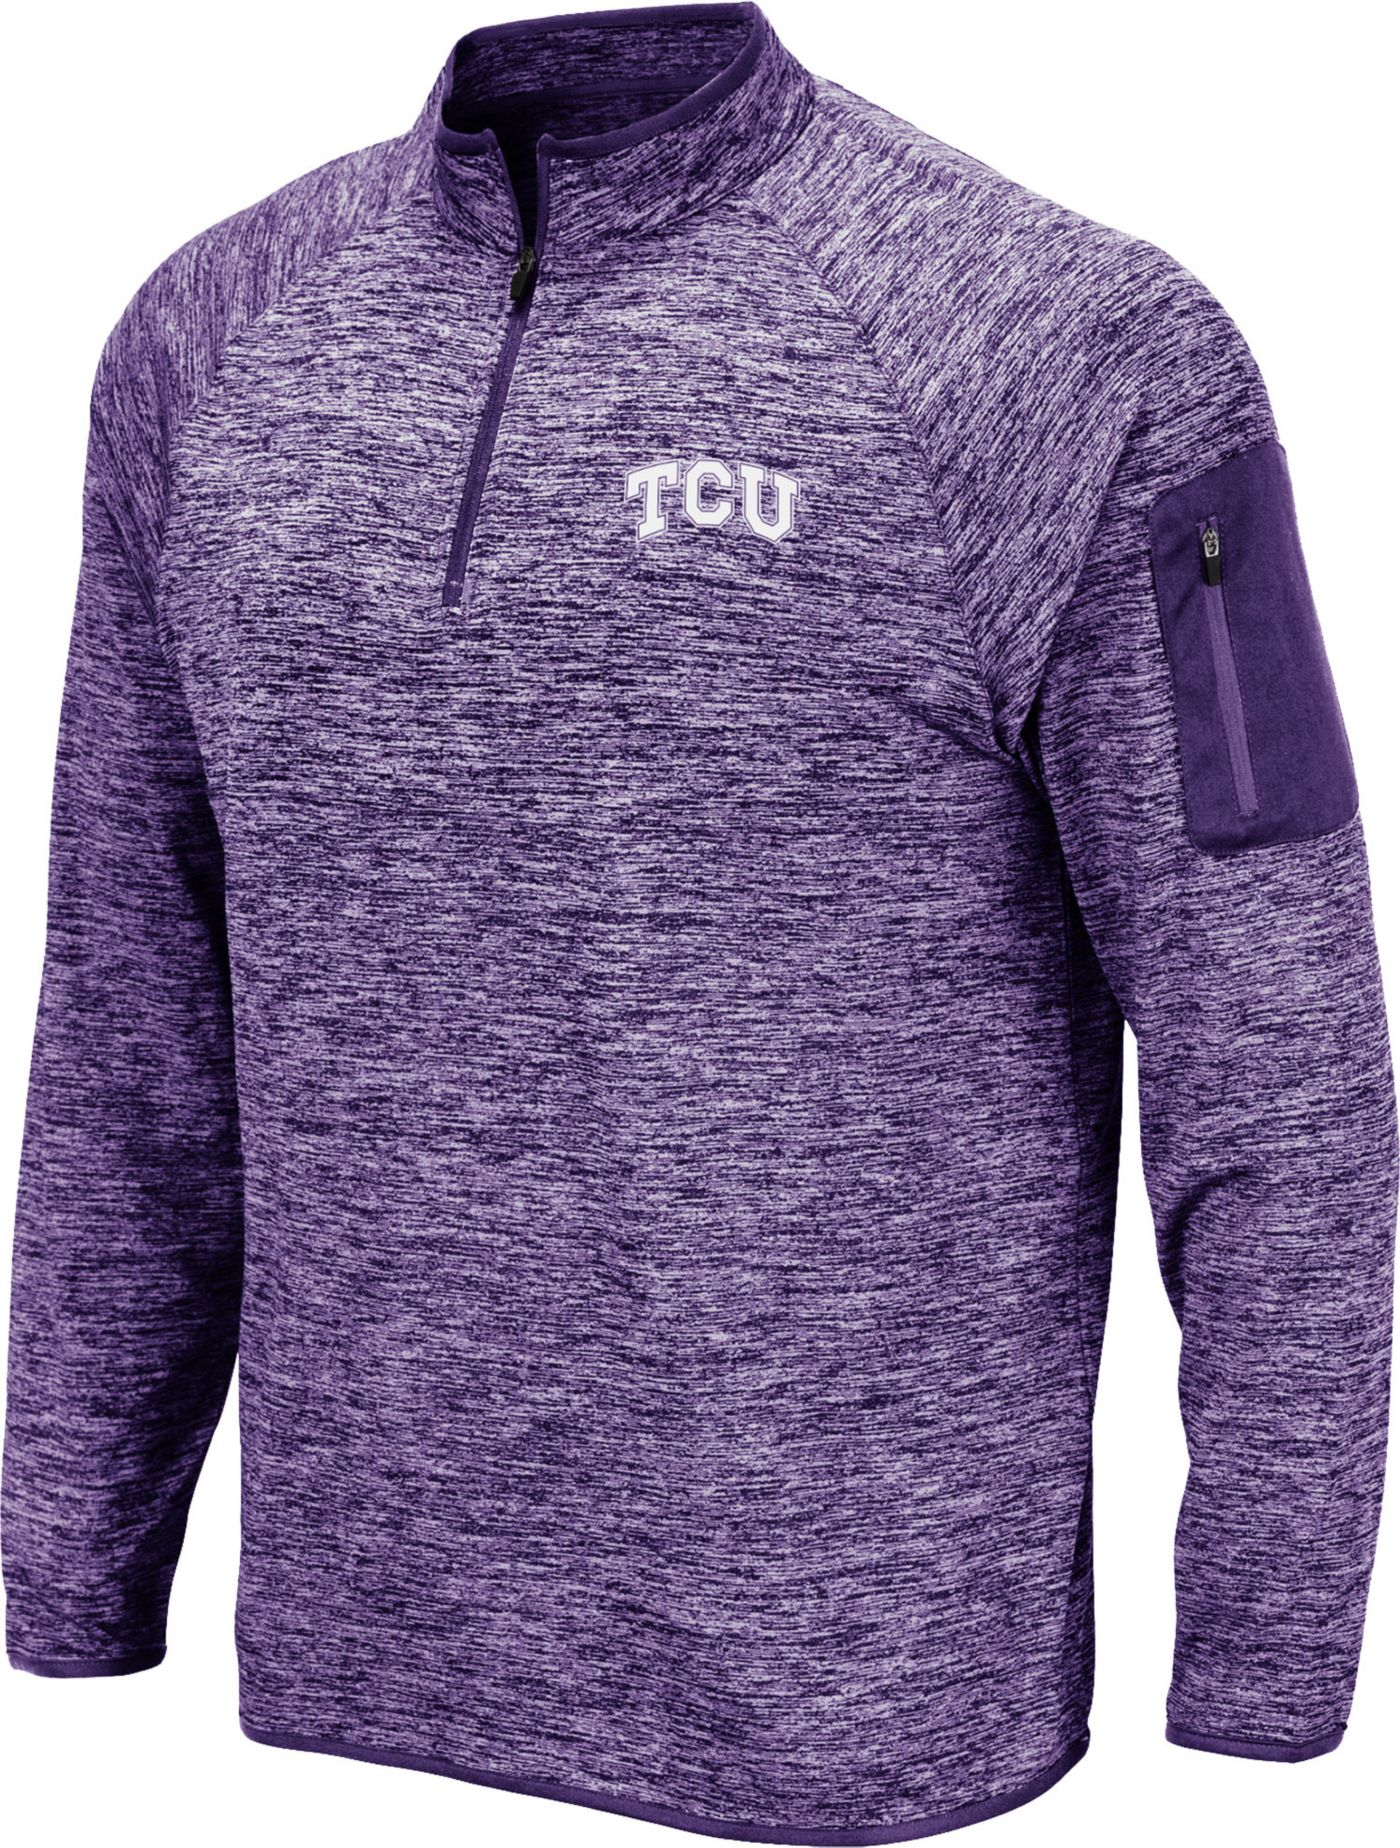 Colosseum Men's TCU Horned Frogs Purple Quarter-Zip Shirt